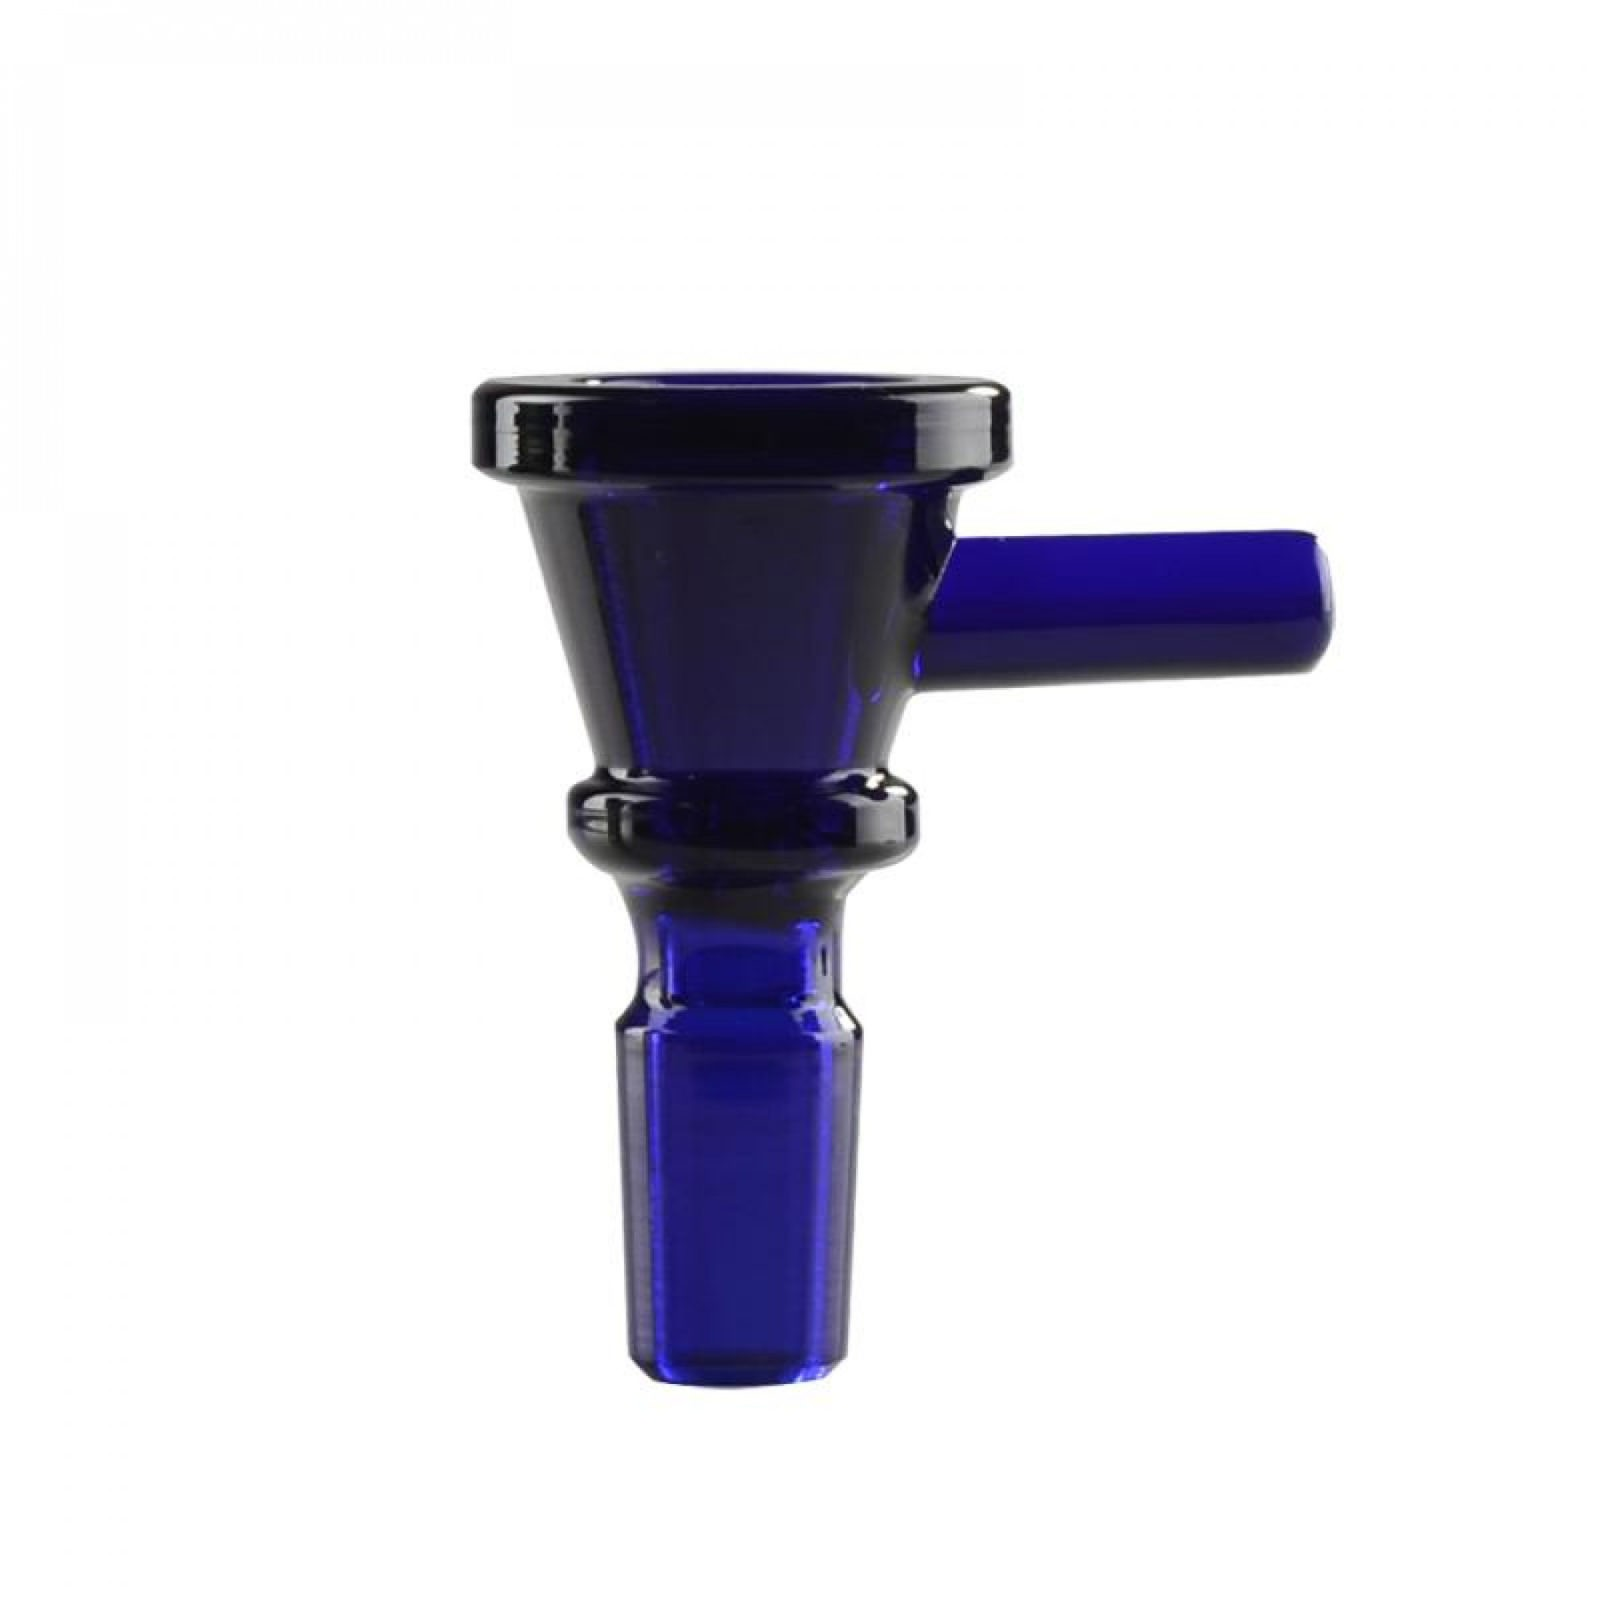 Gear Premium® 14Mm Xl Blaster Cone Pull-Out G1240 &Bull; 2021